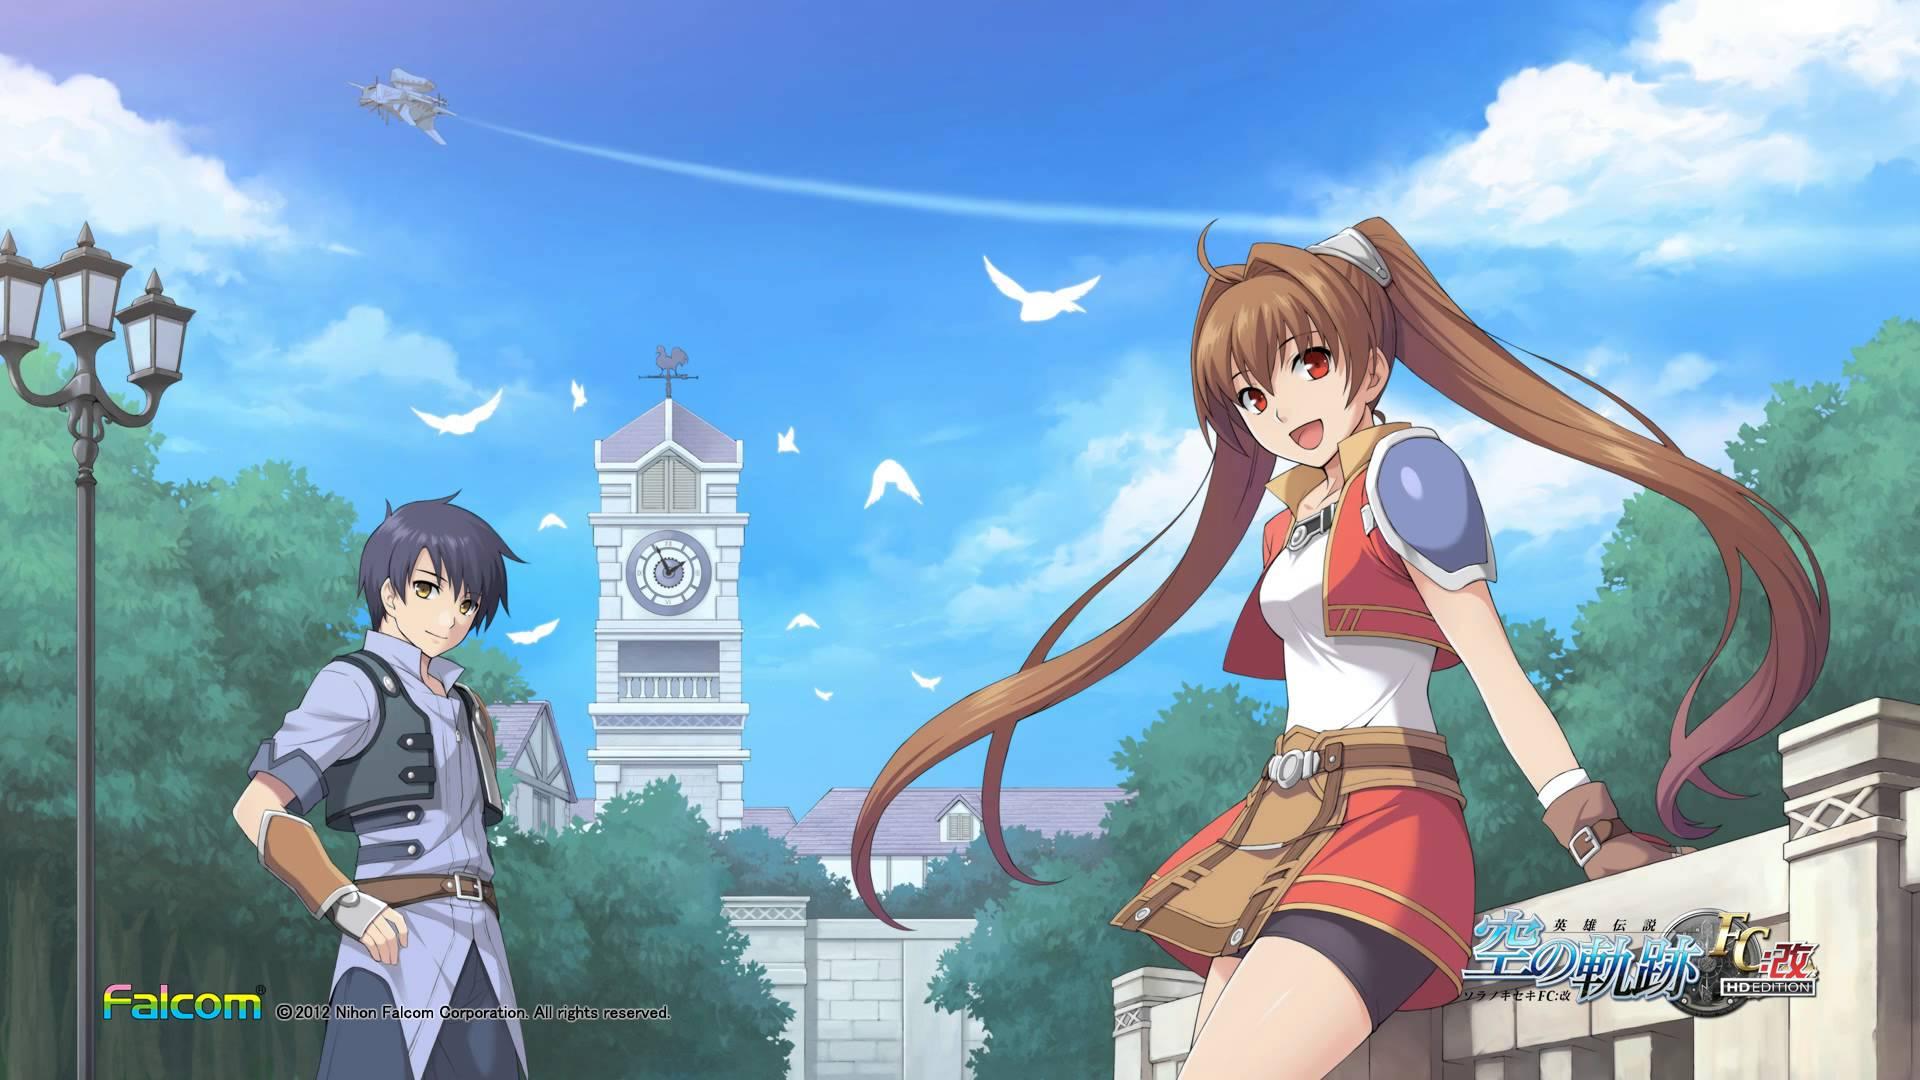 Sora No Kiseki Wallpapers Anime Hq Sora No Kiseki Pictures 4k